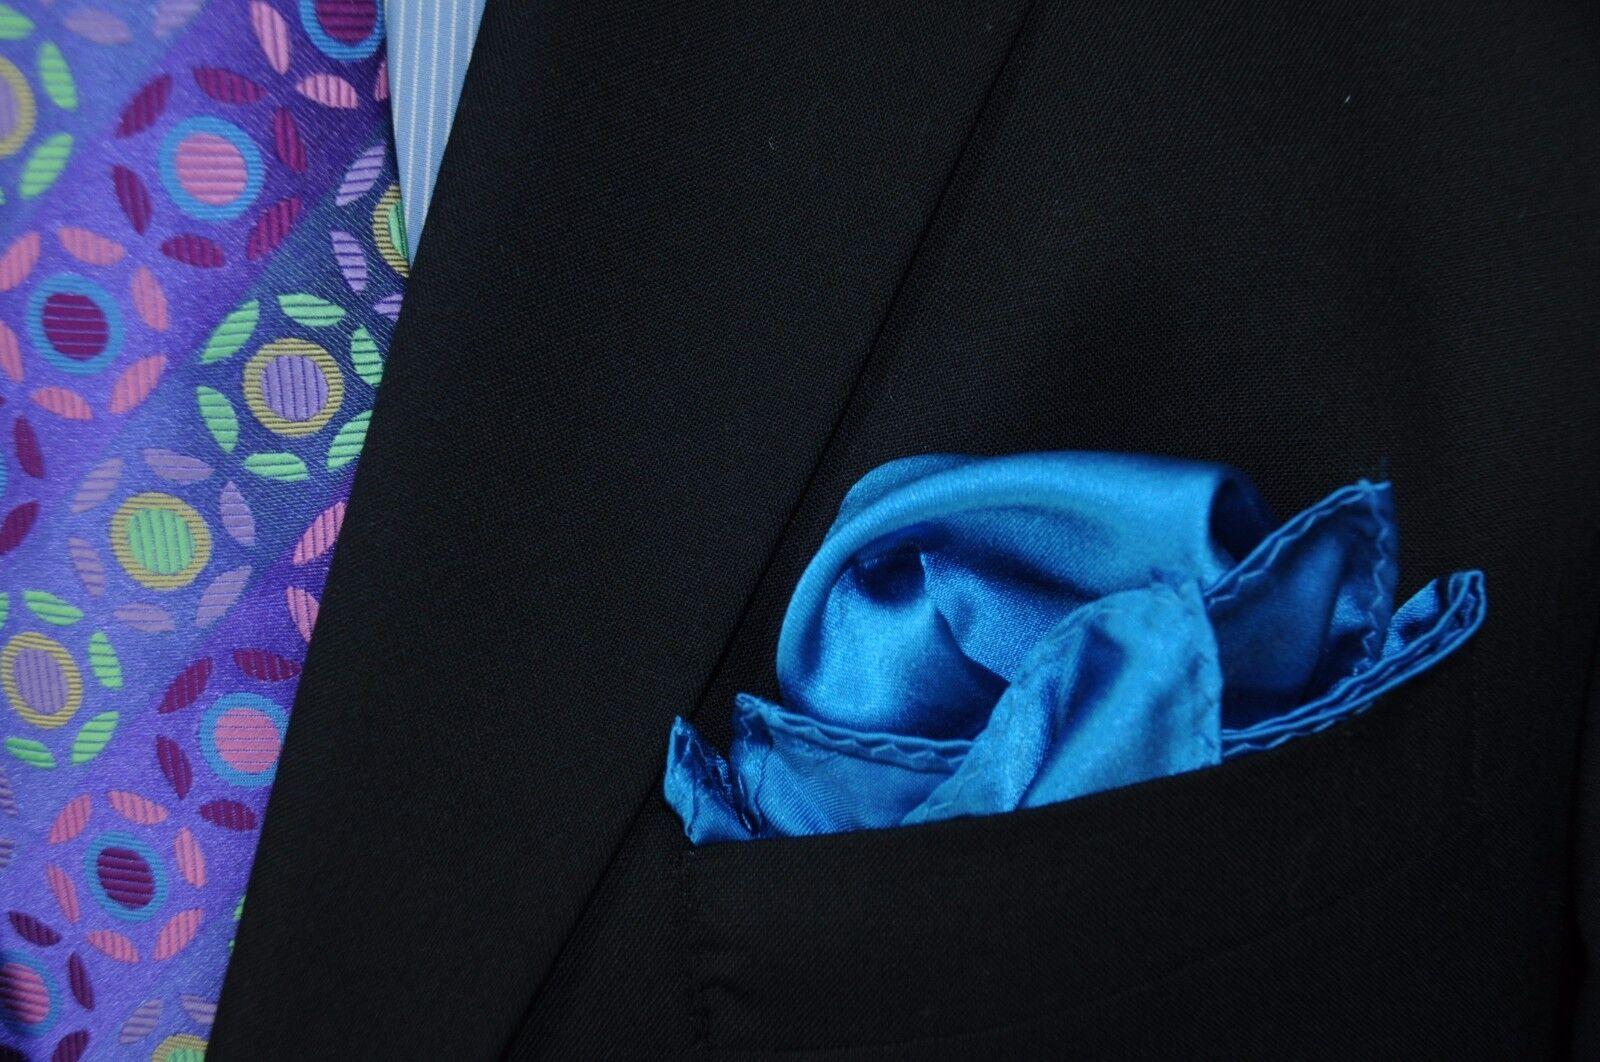 Lord R Colton Masterworks Pocket Square - Vivid Peacock Blue Silk - New